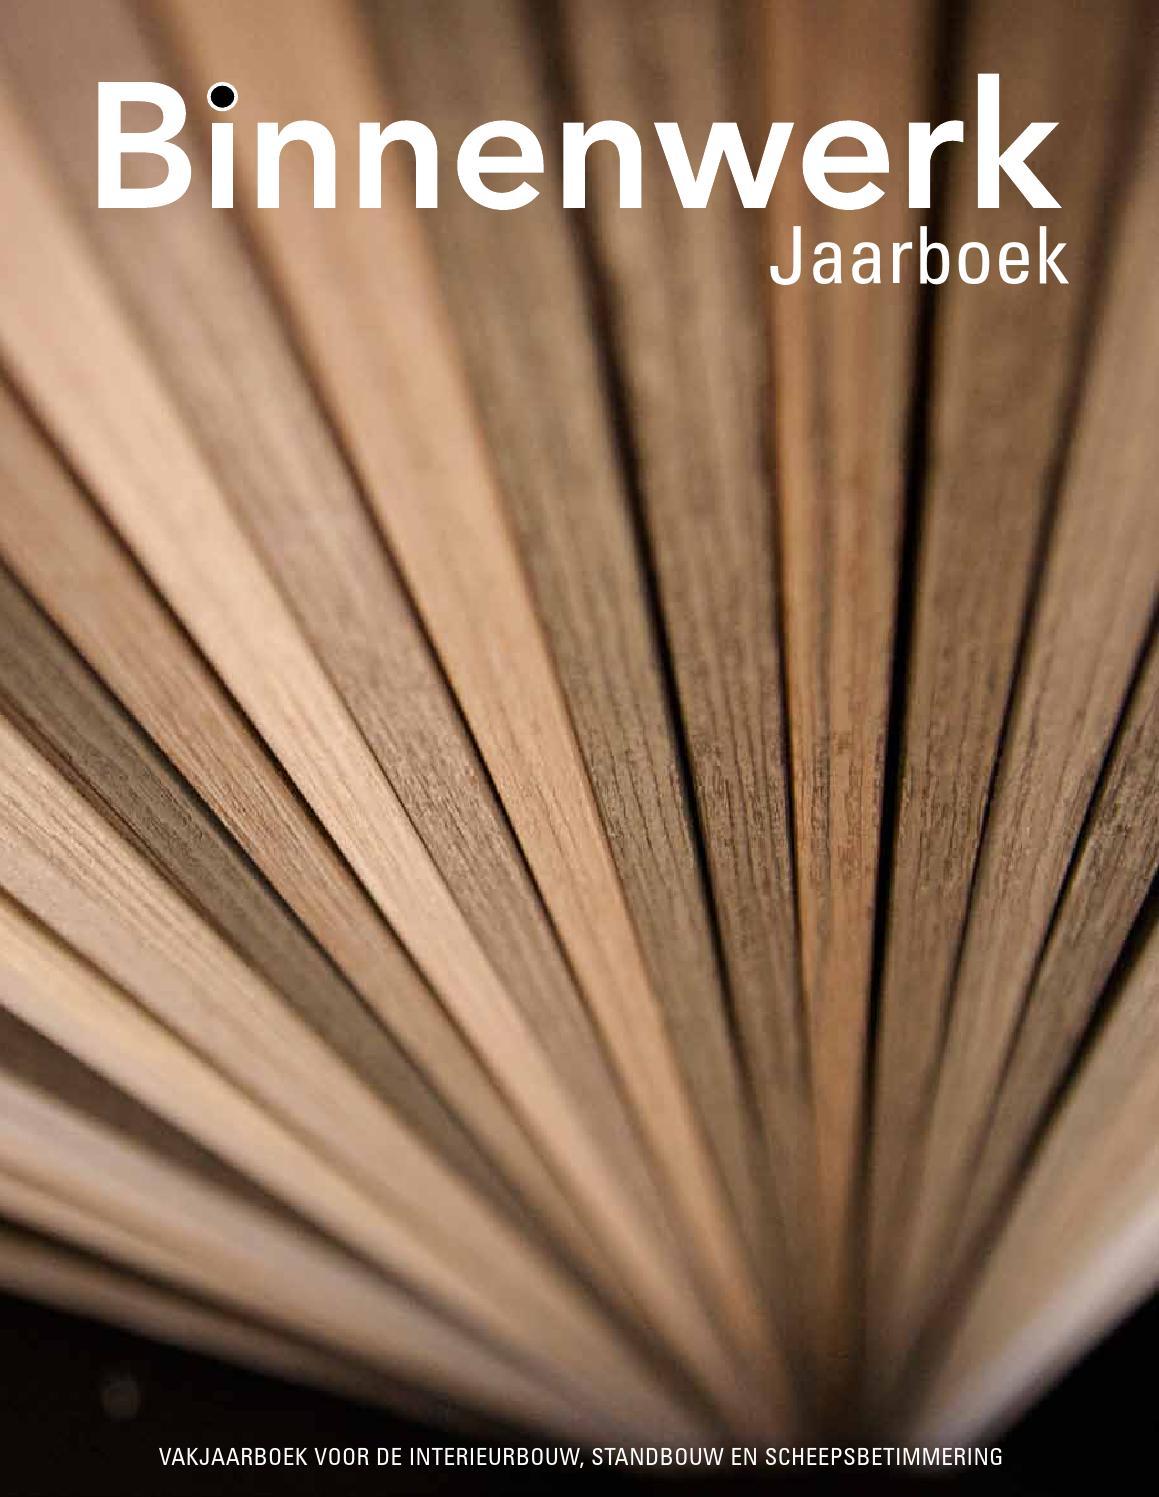 Binnenwerk 2 2014 by louwers uitgeversorganisatie bv   issuu